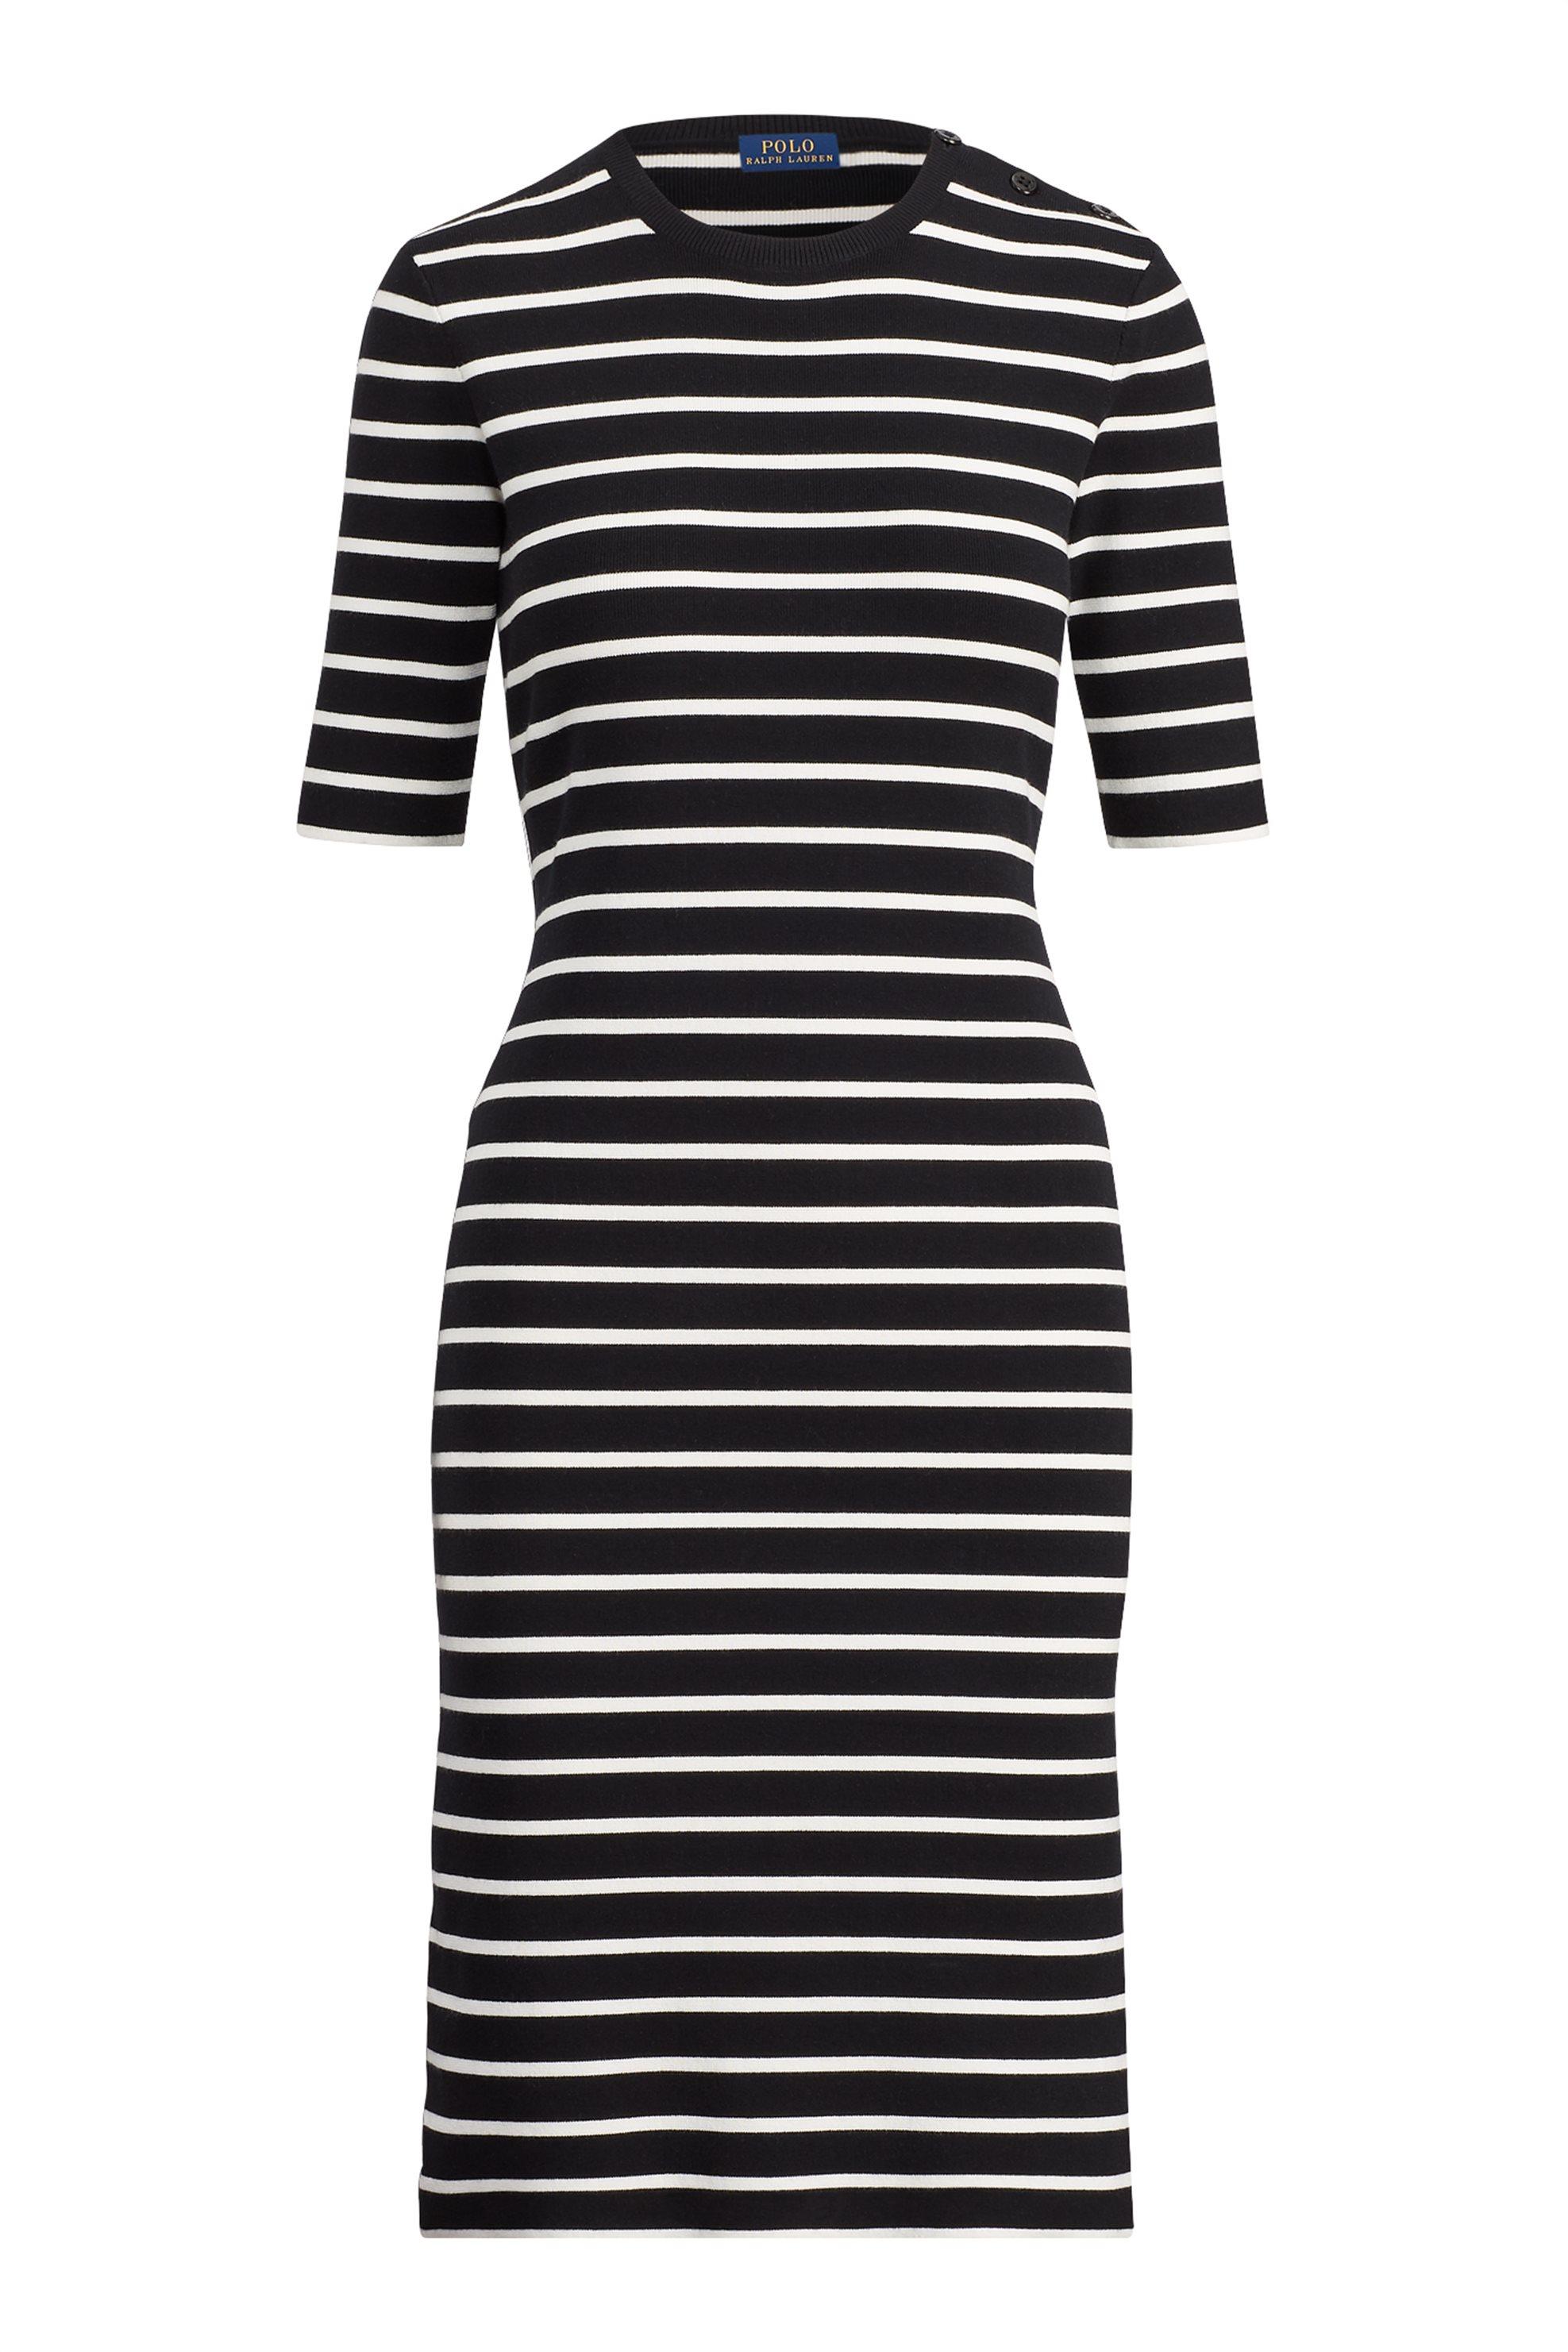 Polo Ralph Lauren γυναικείο φόρεμα ριγέ Button-Shoulder jumper Dress - 211710626 γυναικα   ρουχα   φορέματα   midi φορέματα